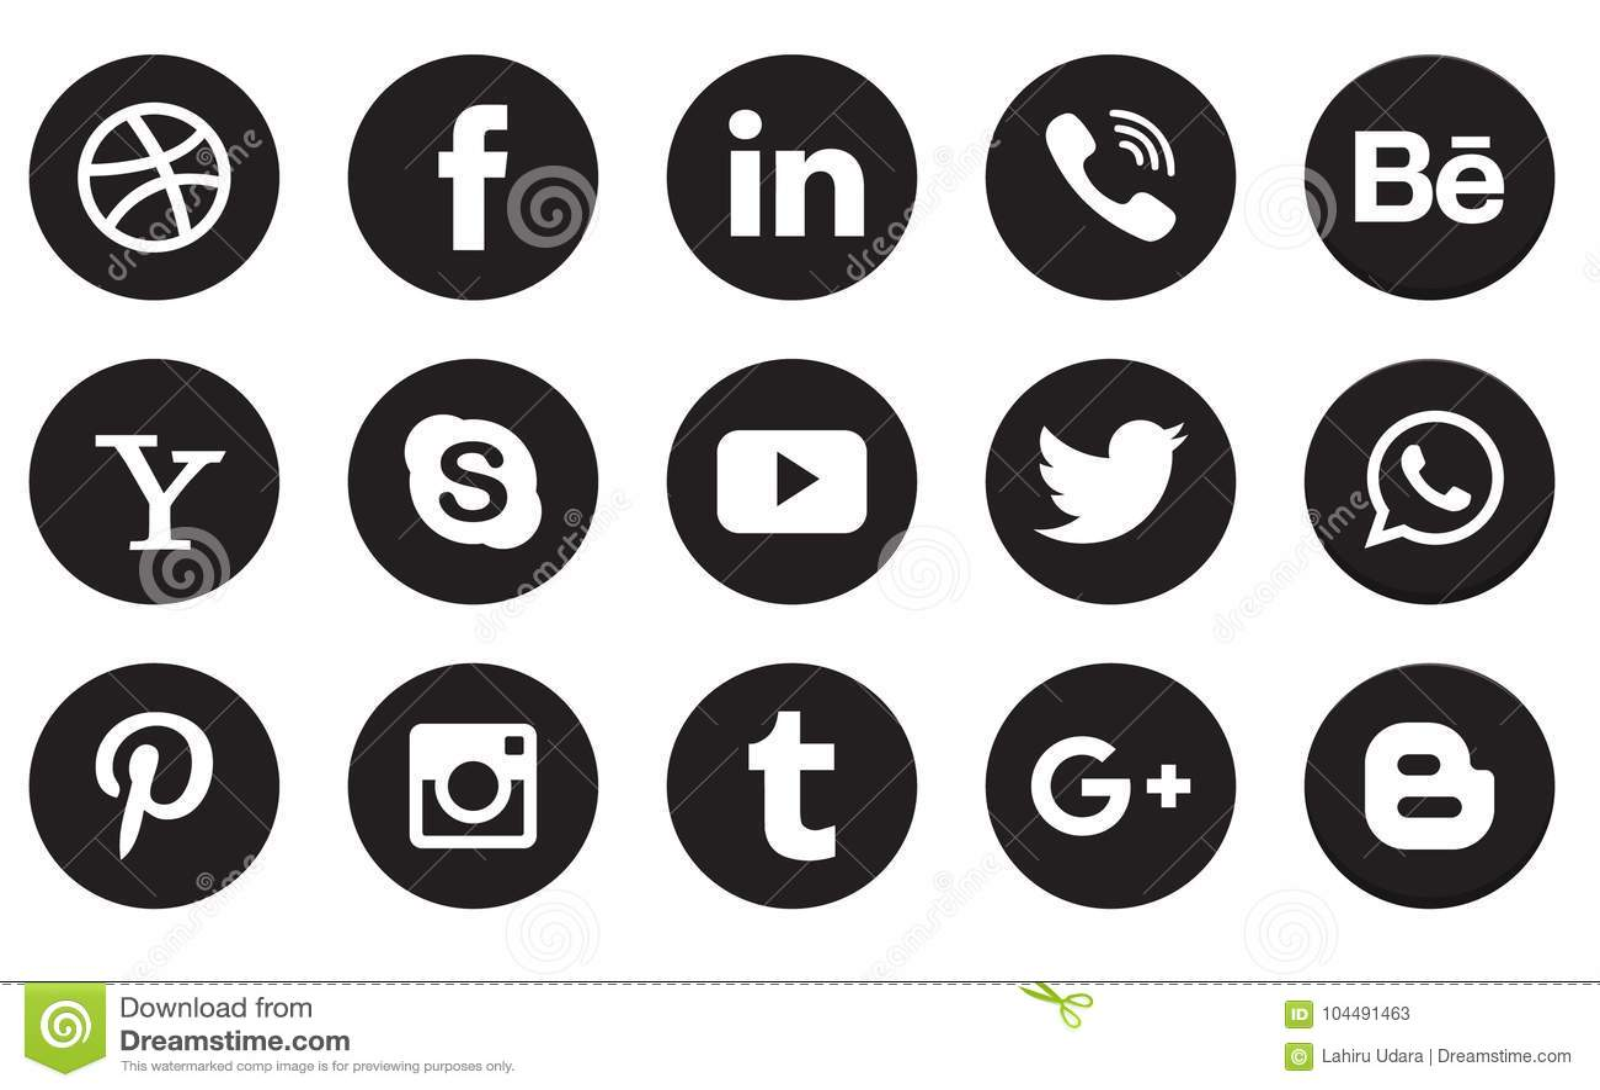 Social media icon collection buttons